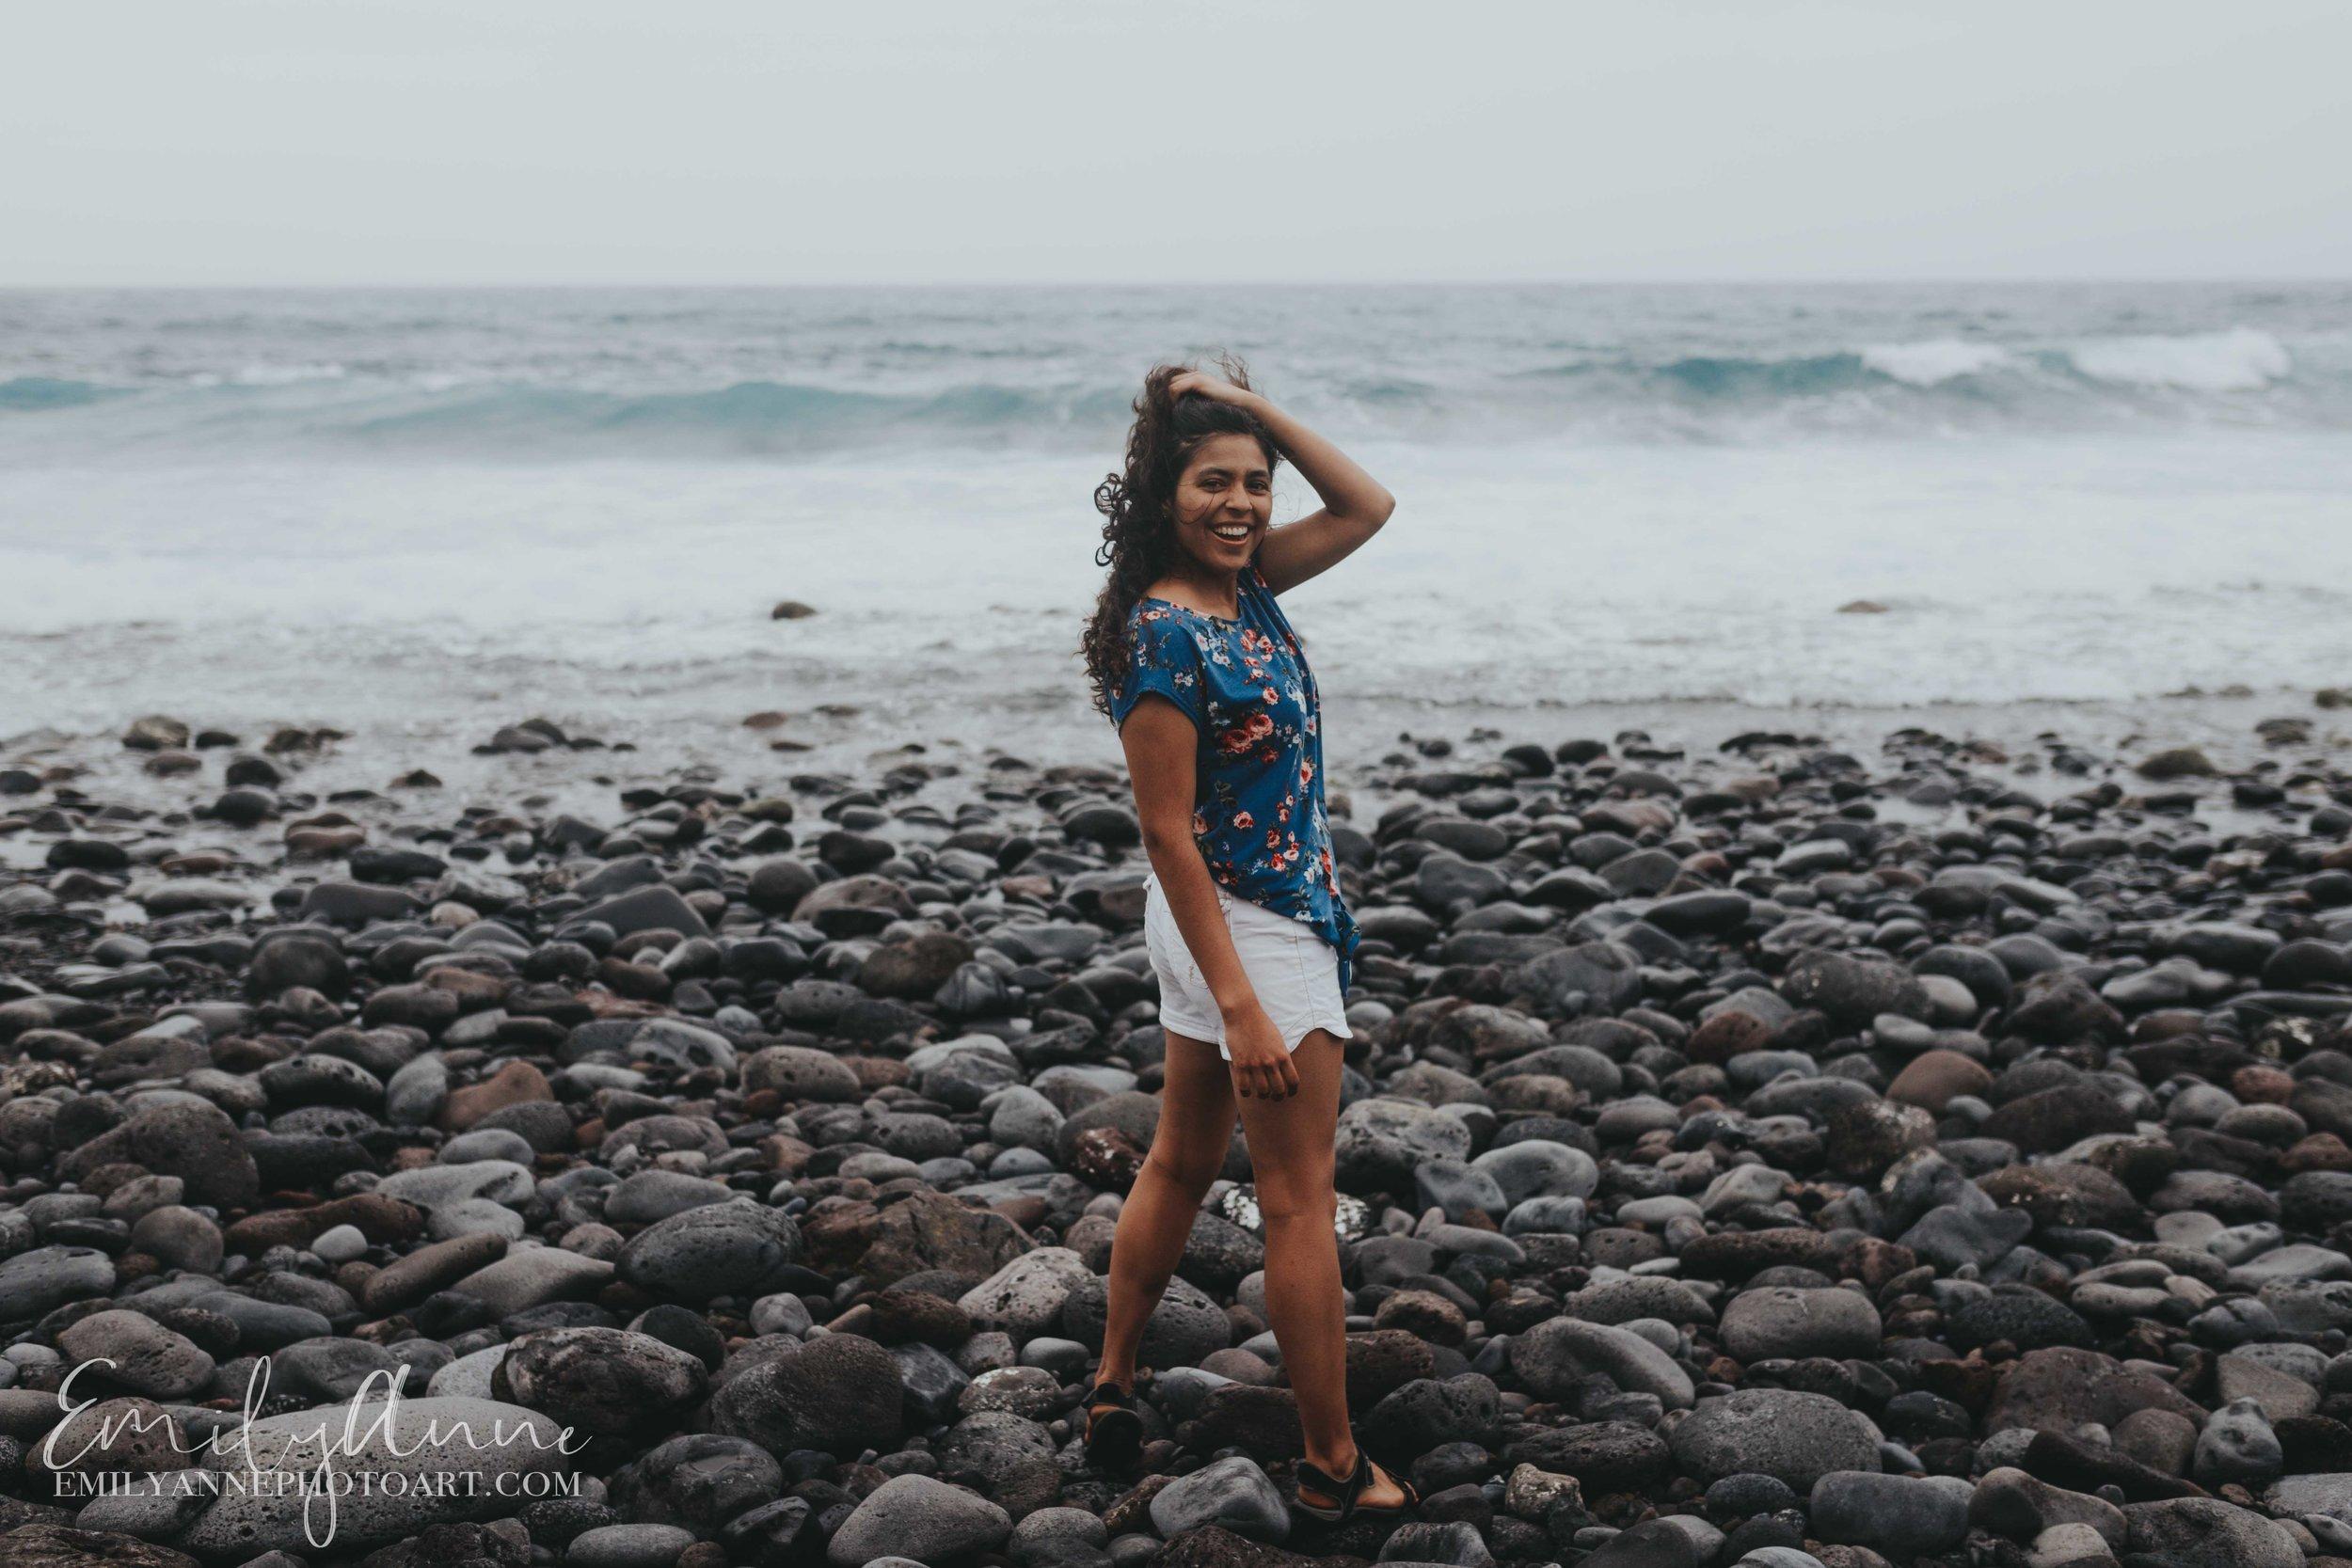 best model photography emily Anne photo art tenerife Canary Islands photographer